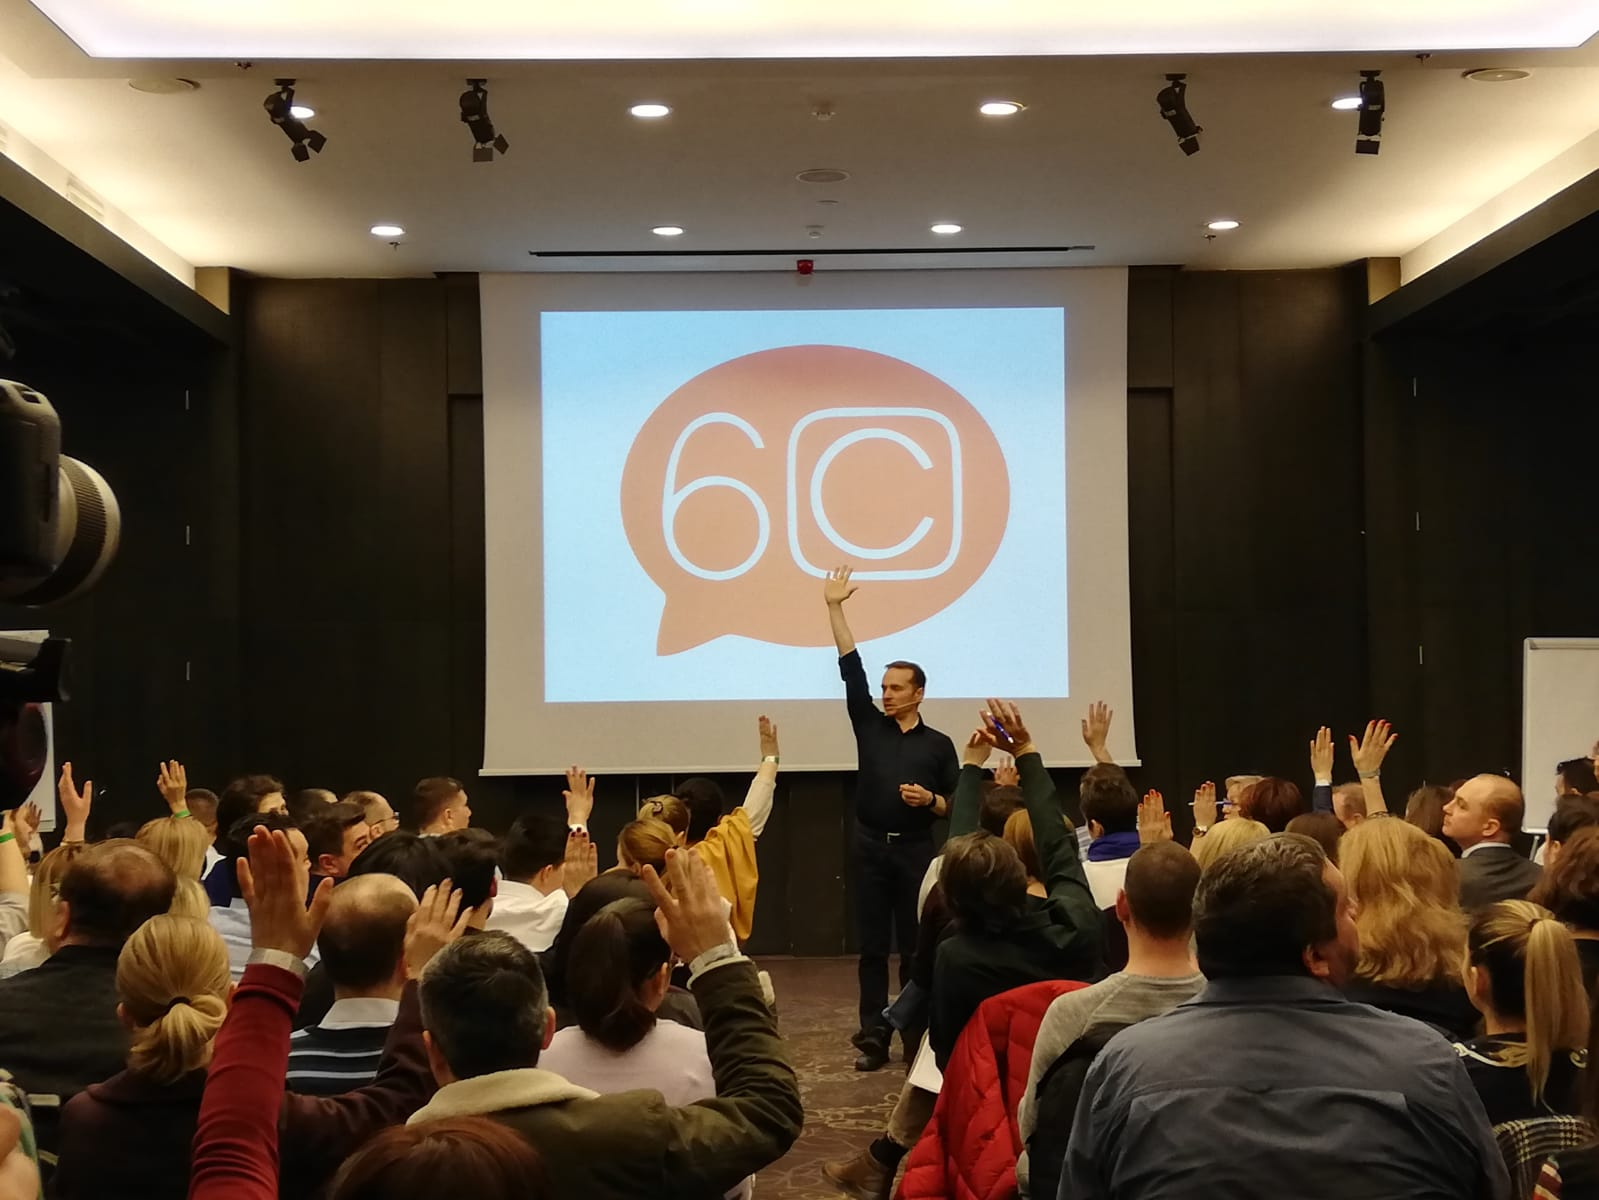 Charisma | Cum sa progresezi in cariera | Conferinta 6C - Cariera | Andy Szekely|